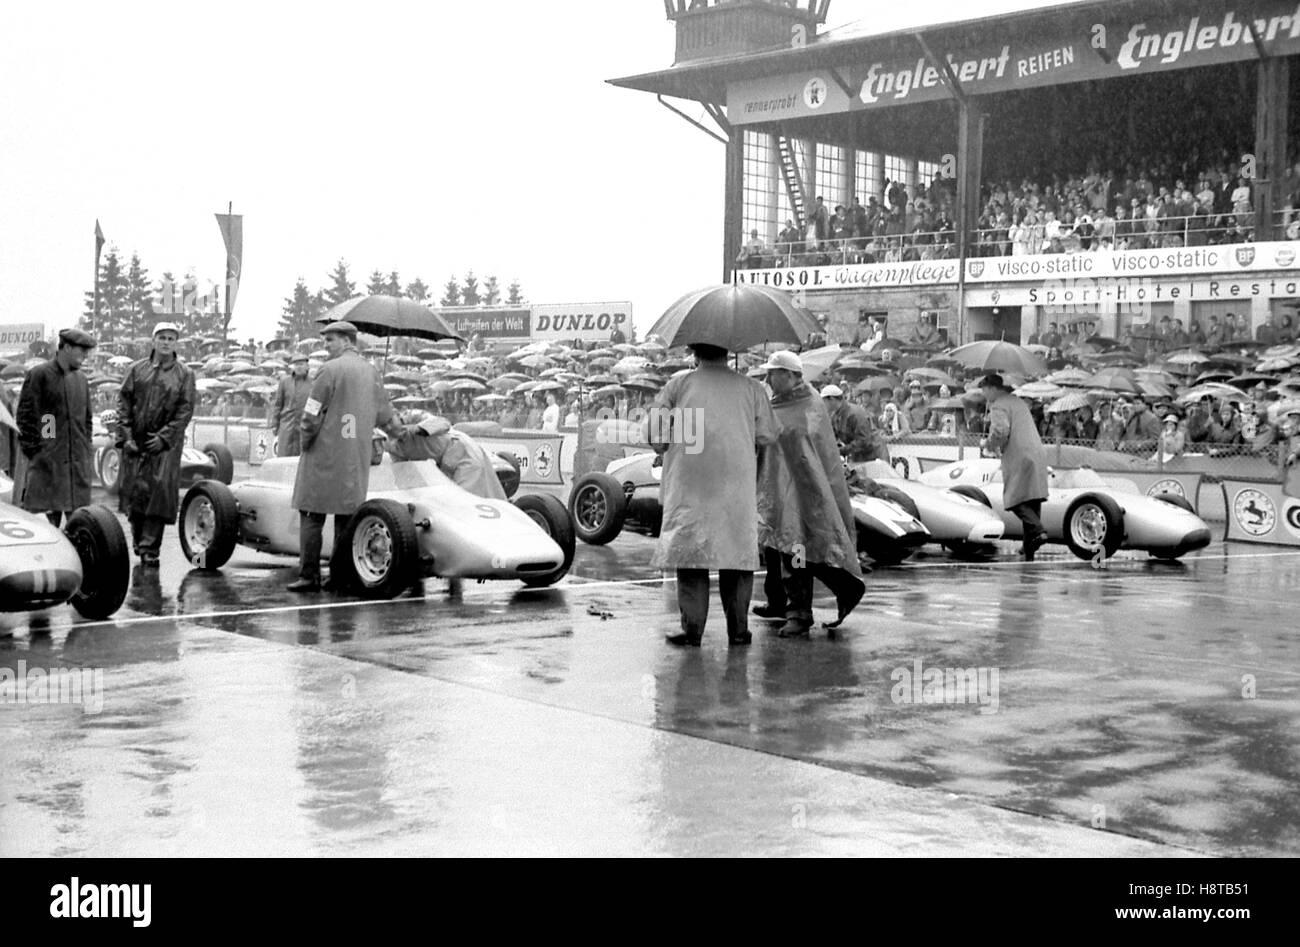 1960 GERMAN GP GRID FORMS UP - Stock Image